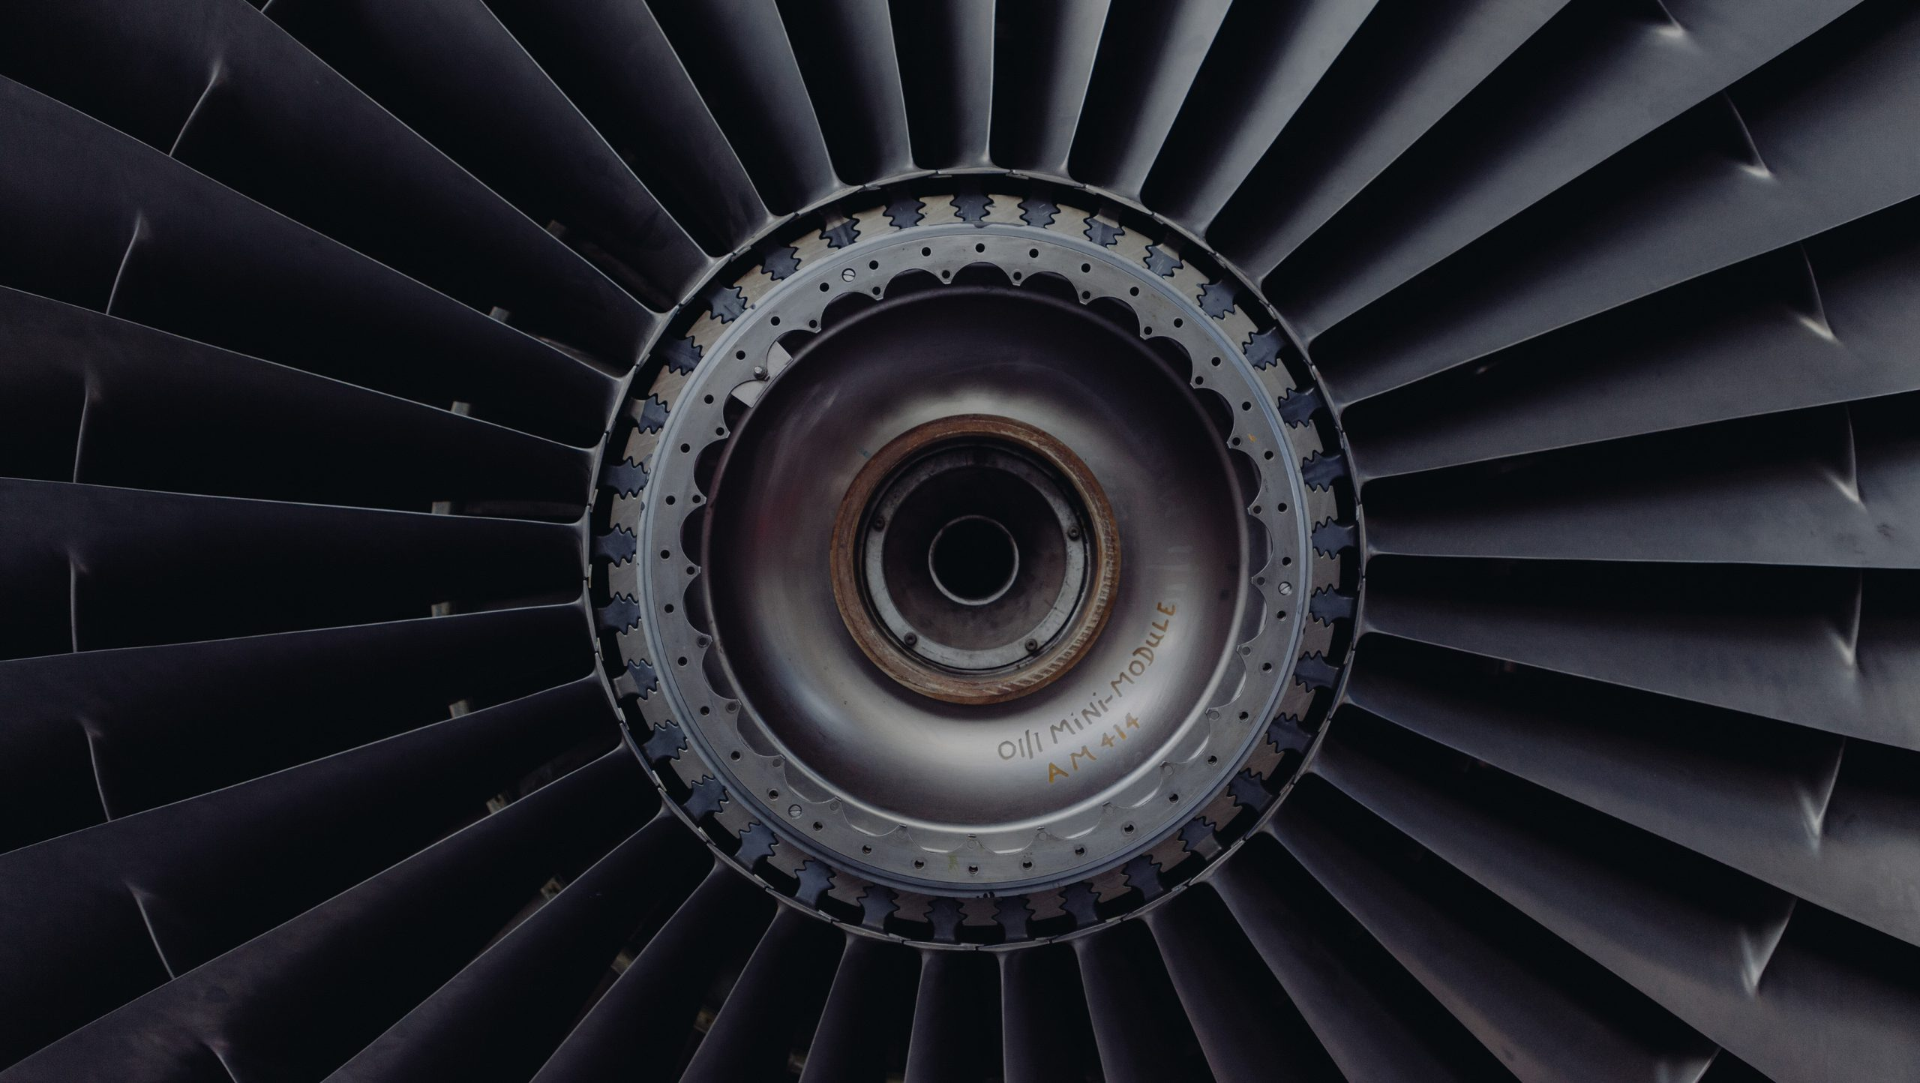 21 Years of Engineering Success 2000-2021